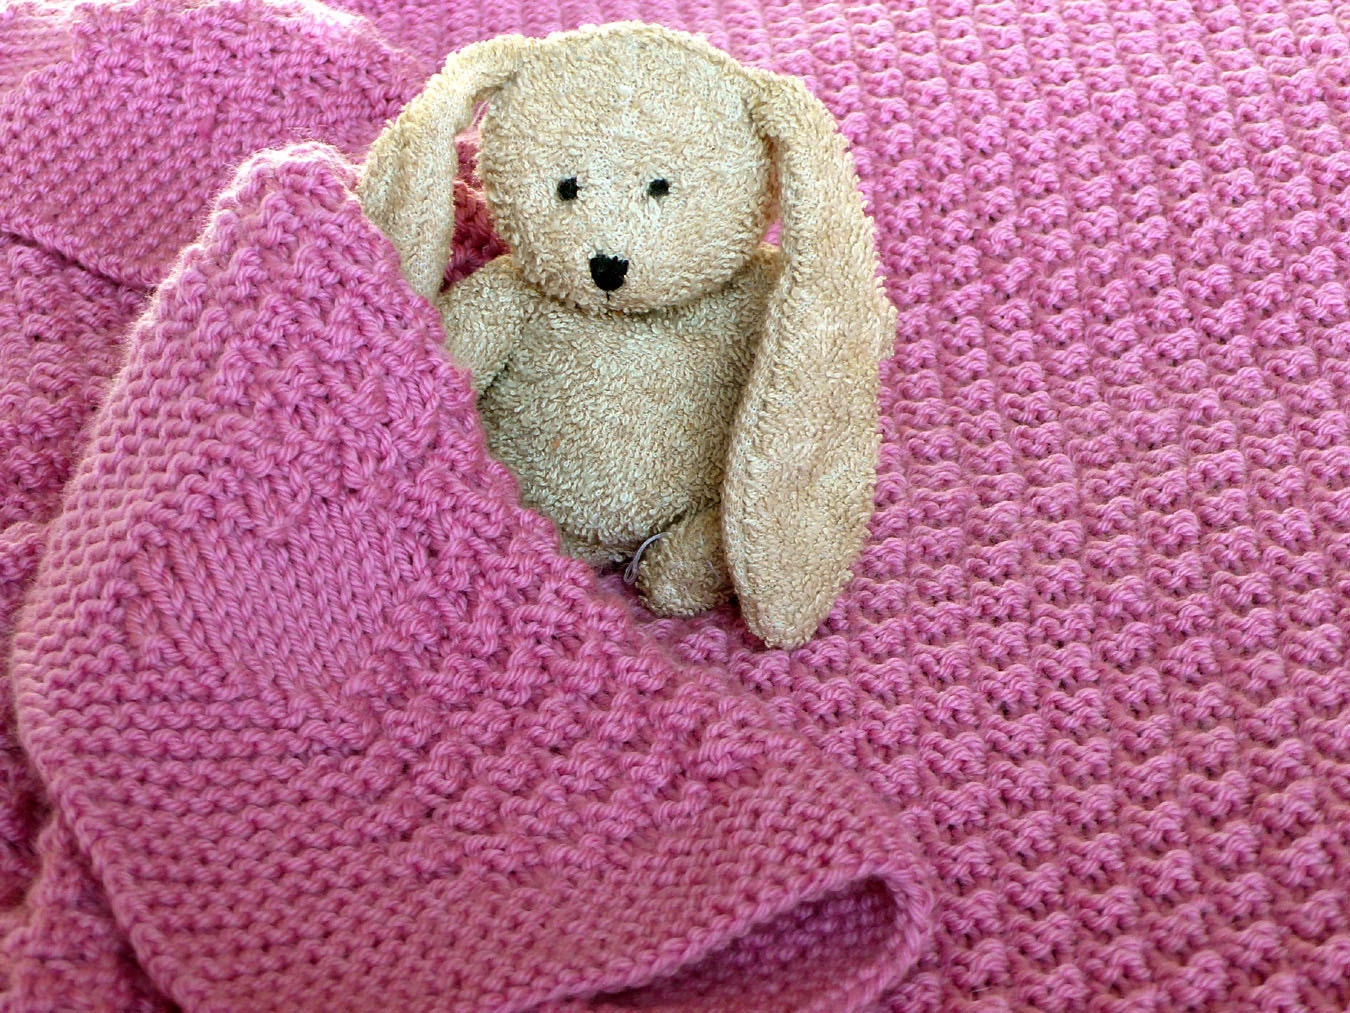 Knitting pattern heart blanket yaasfo for baby heart blanket knitting pattern bankloansurffo Gallery